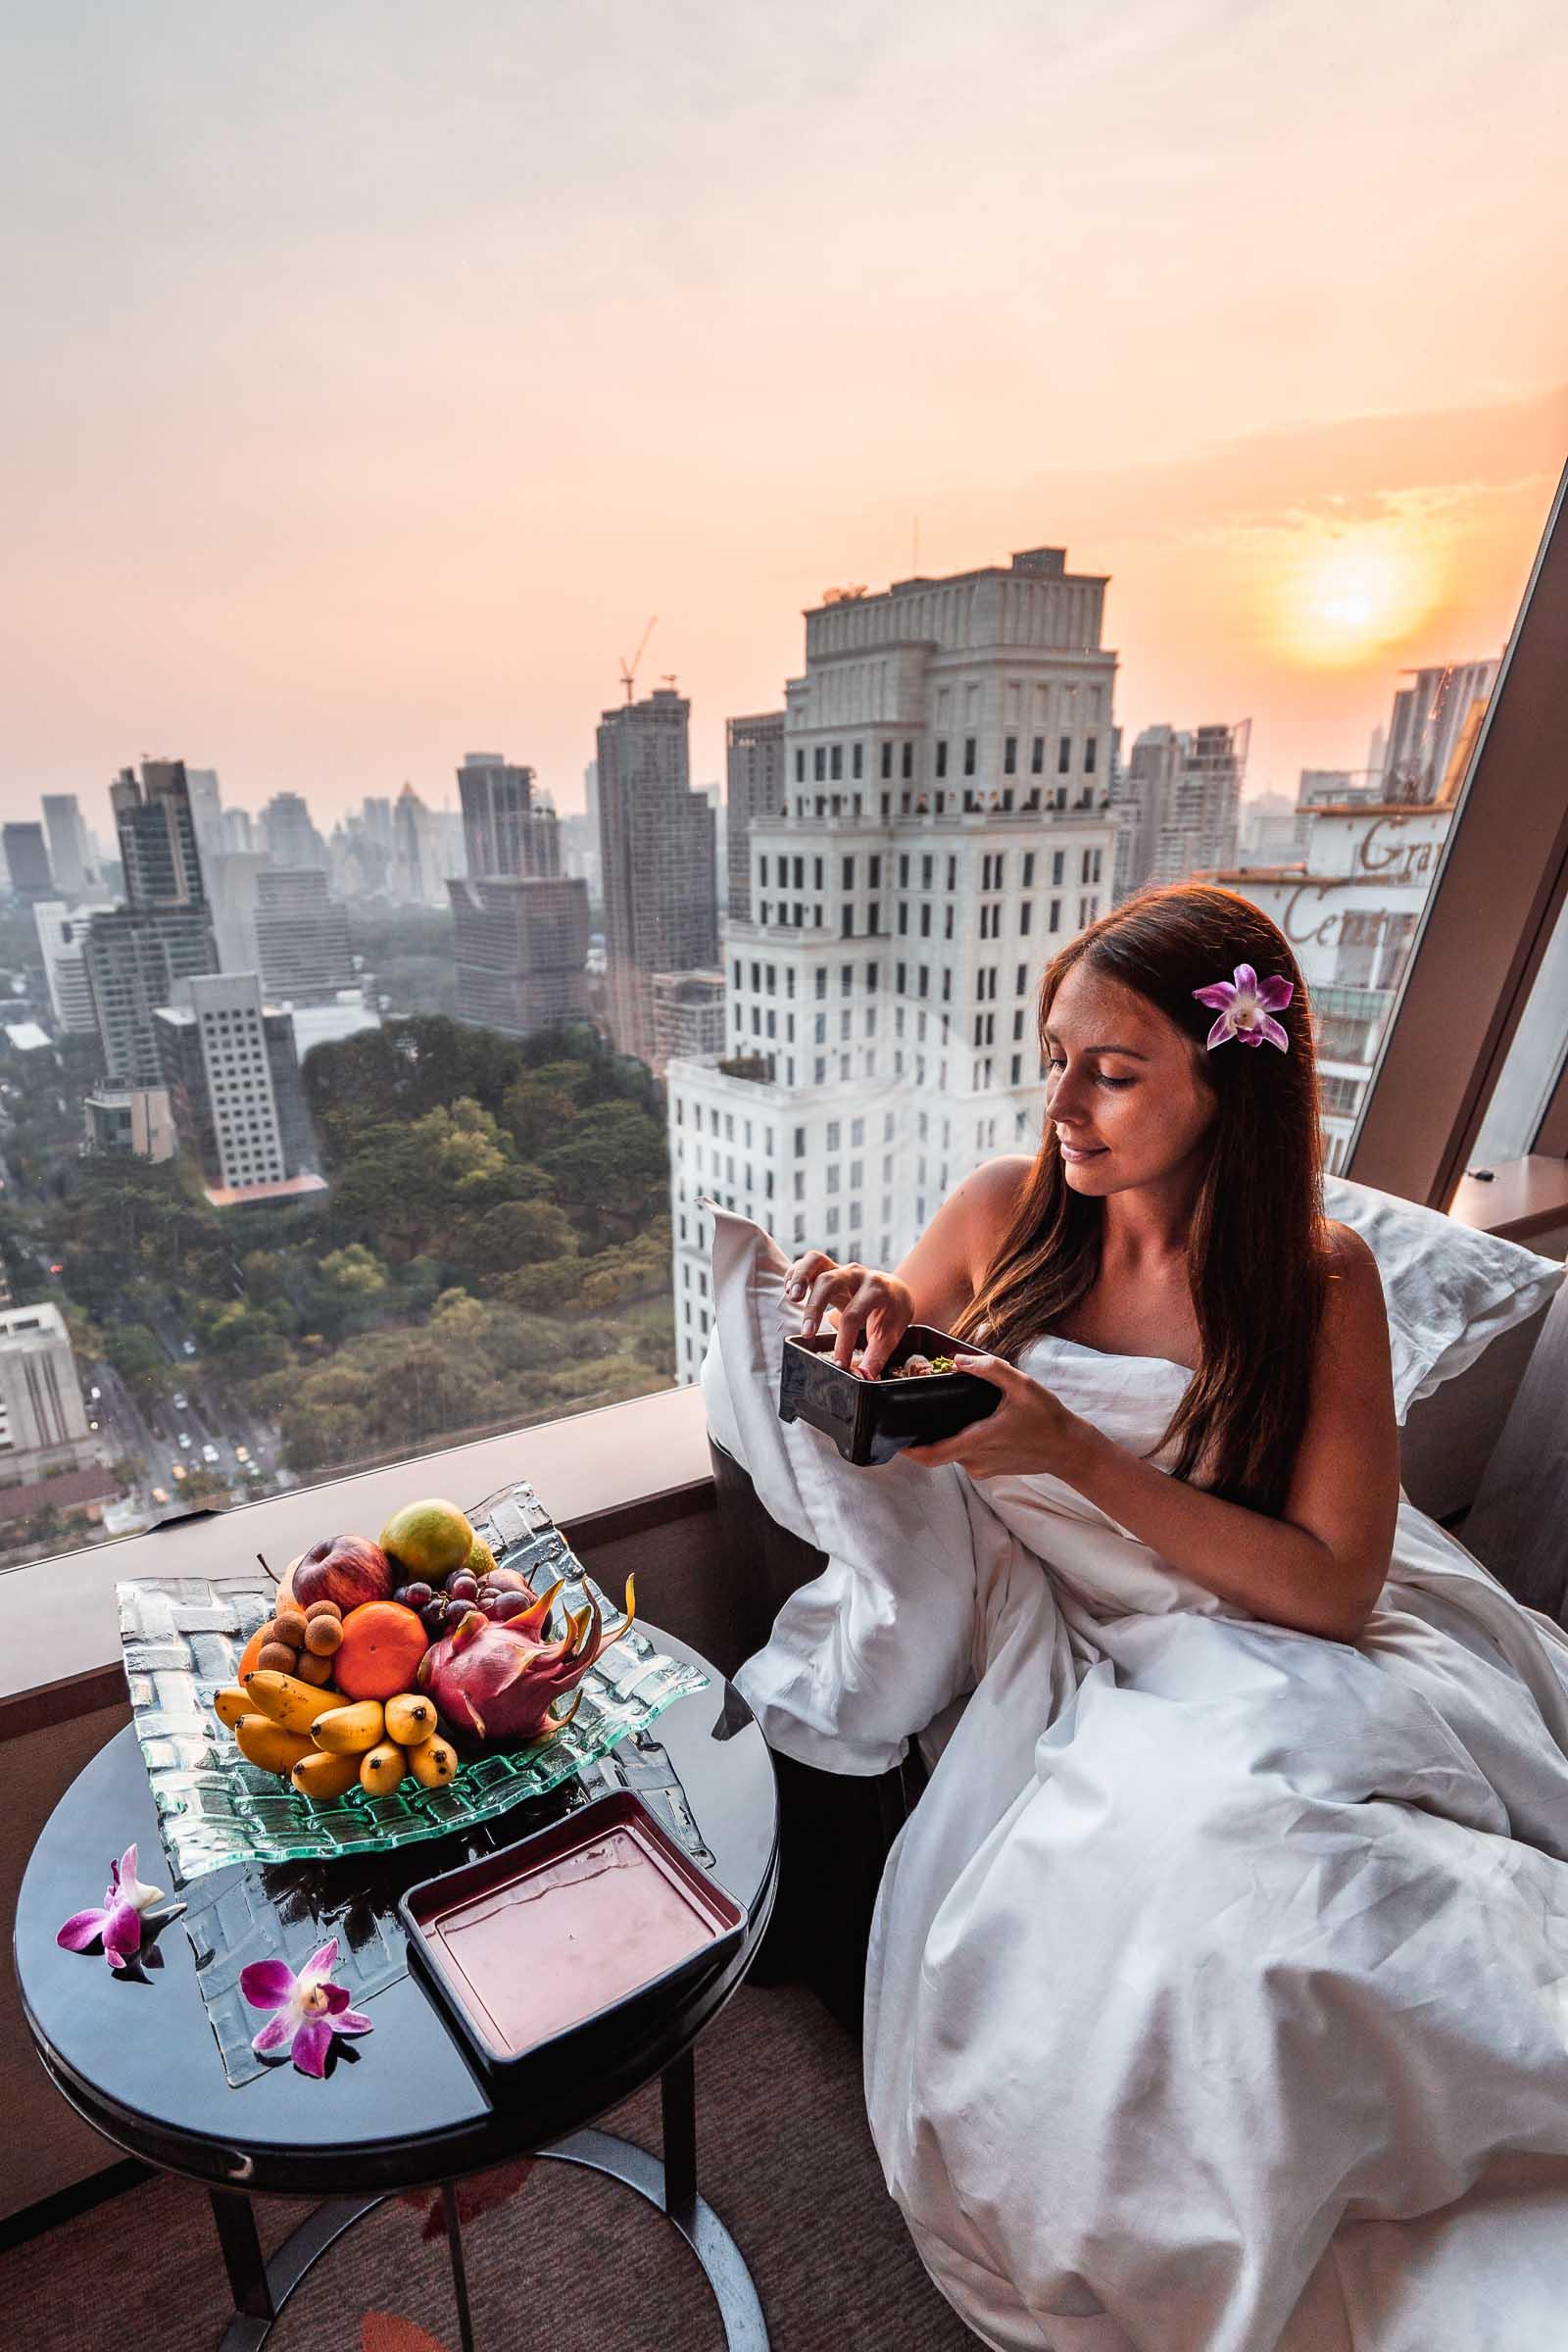 Girl eating breakfast with a view of the Bangkok skyline in the background in The Okura Prestige Bangkok